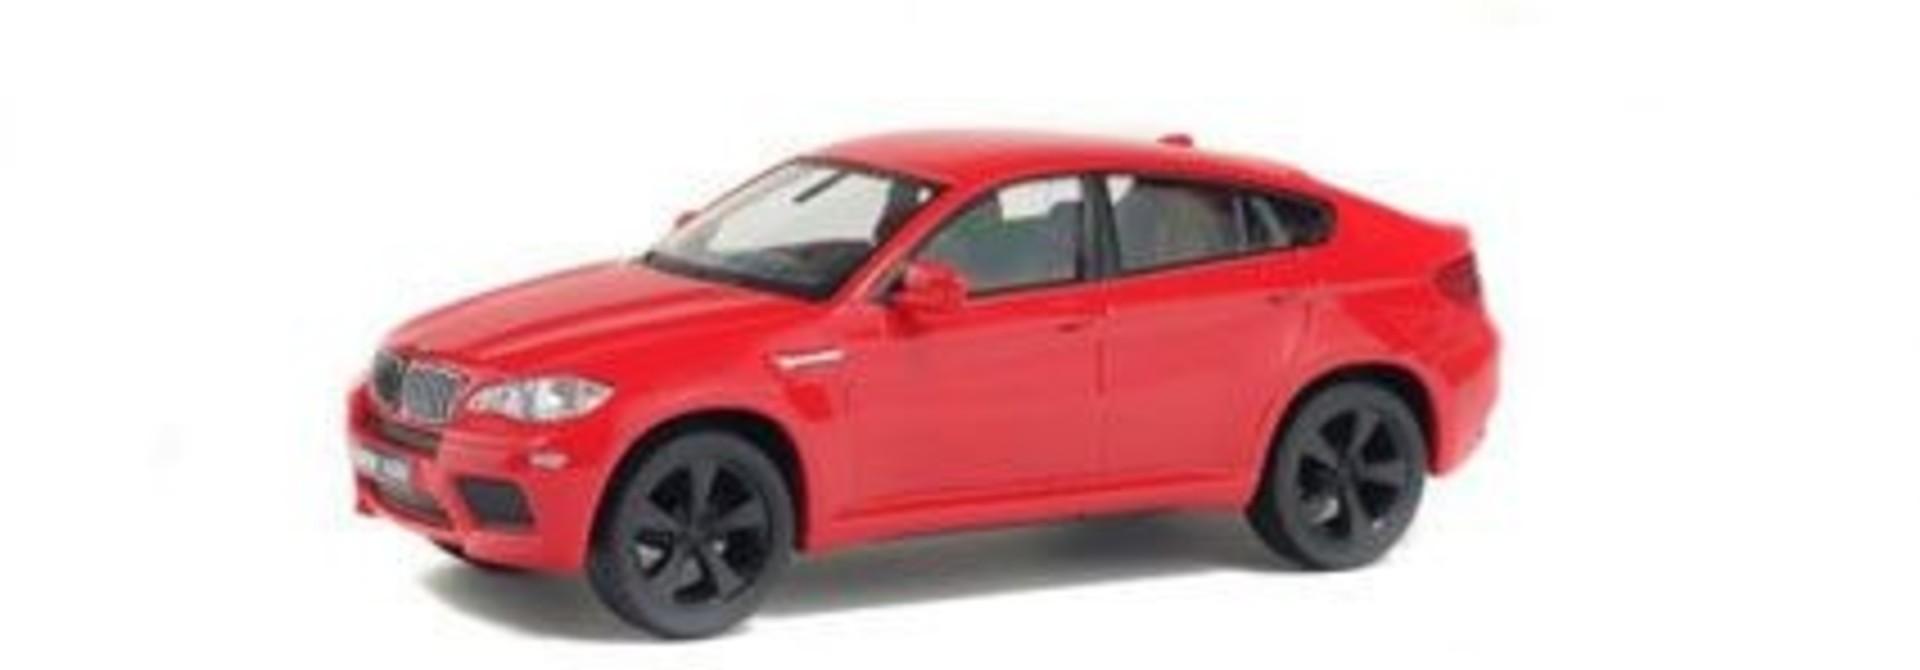 1:43 BMW X6 M, rood